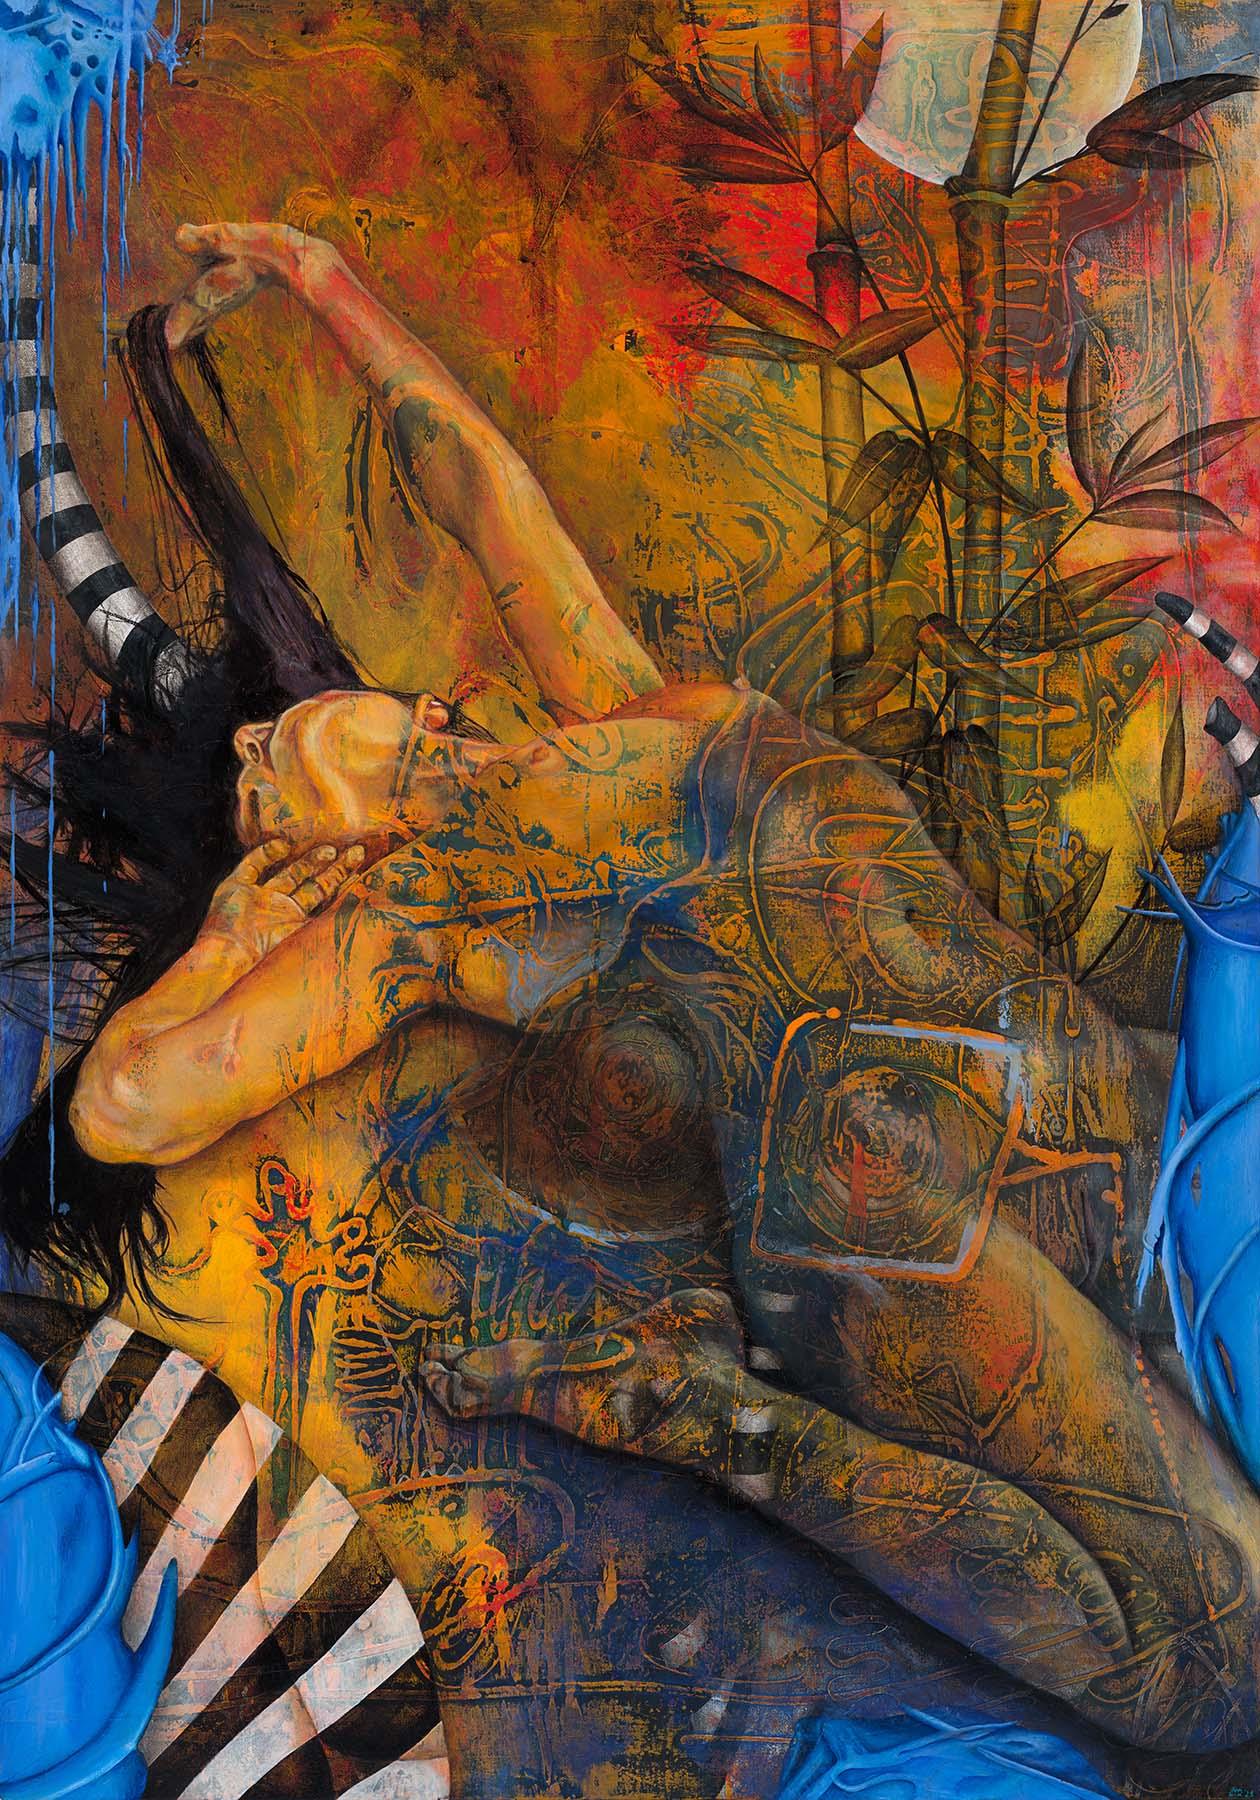 Figurative acrylic painting of nude woman